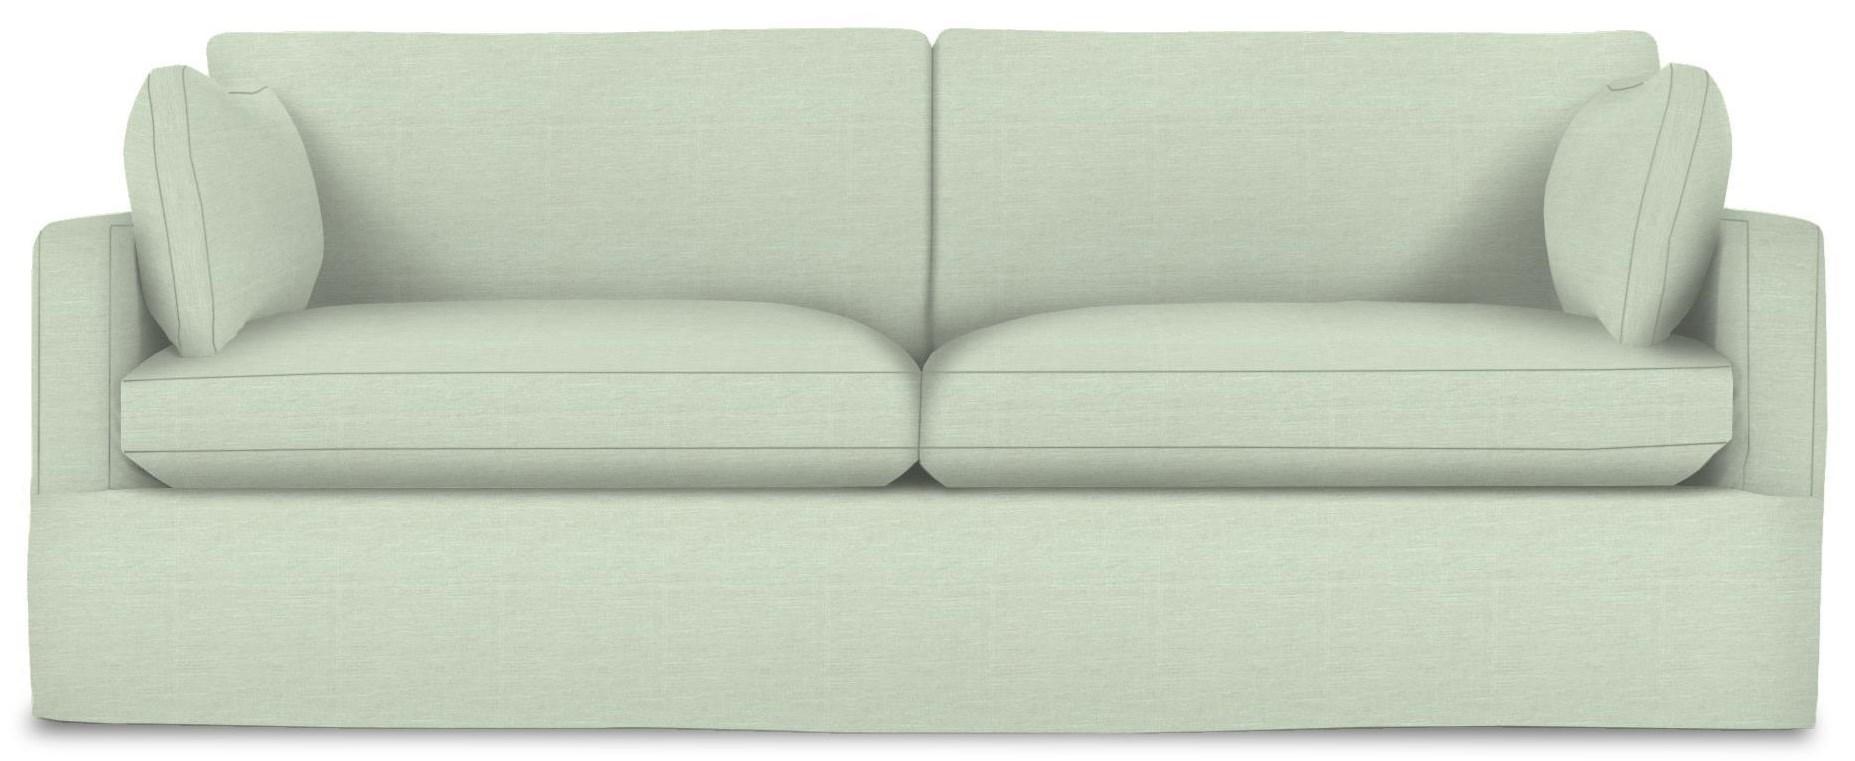 Sylvie Slip Cover Sofa by Rowe at Johnny Janosik